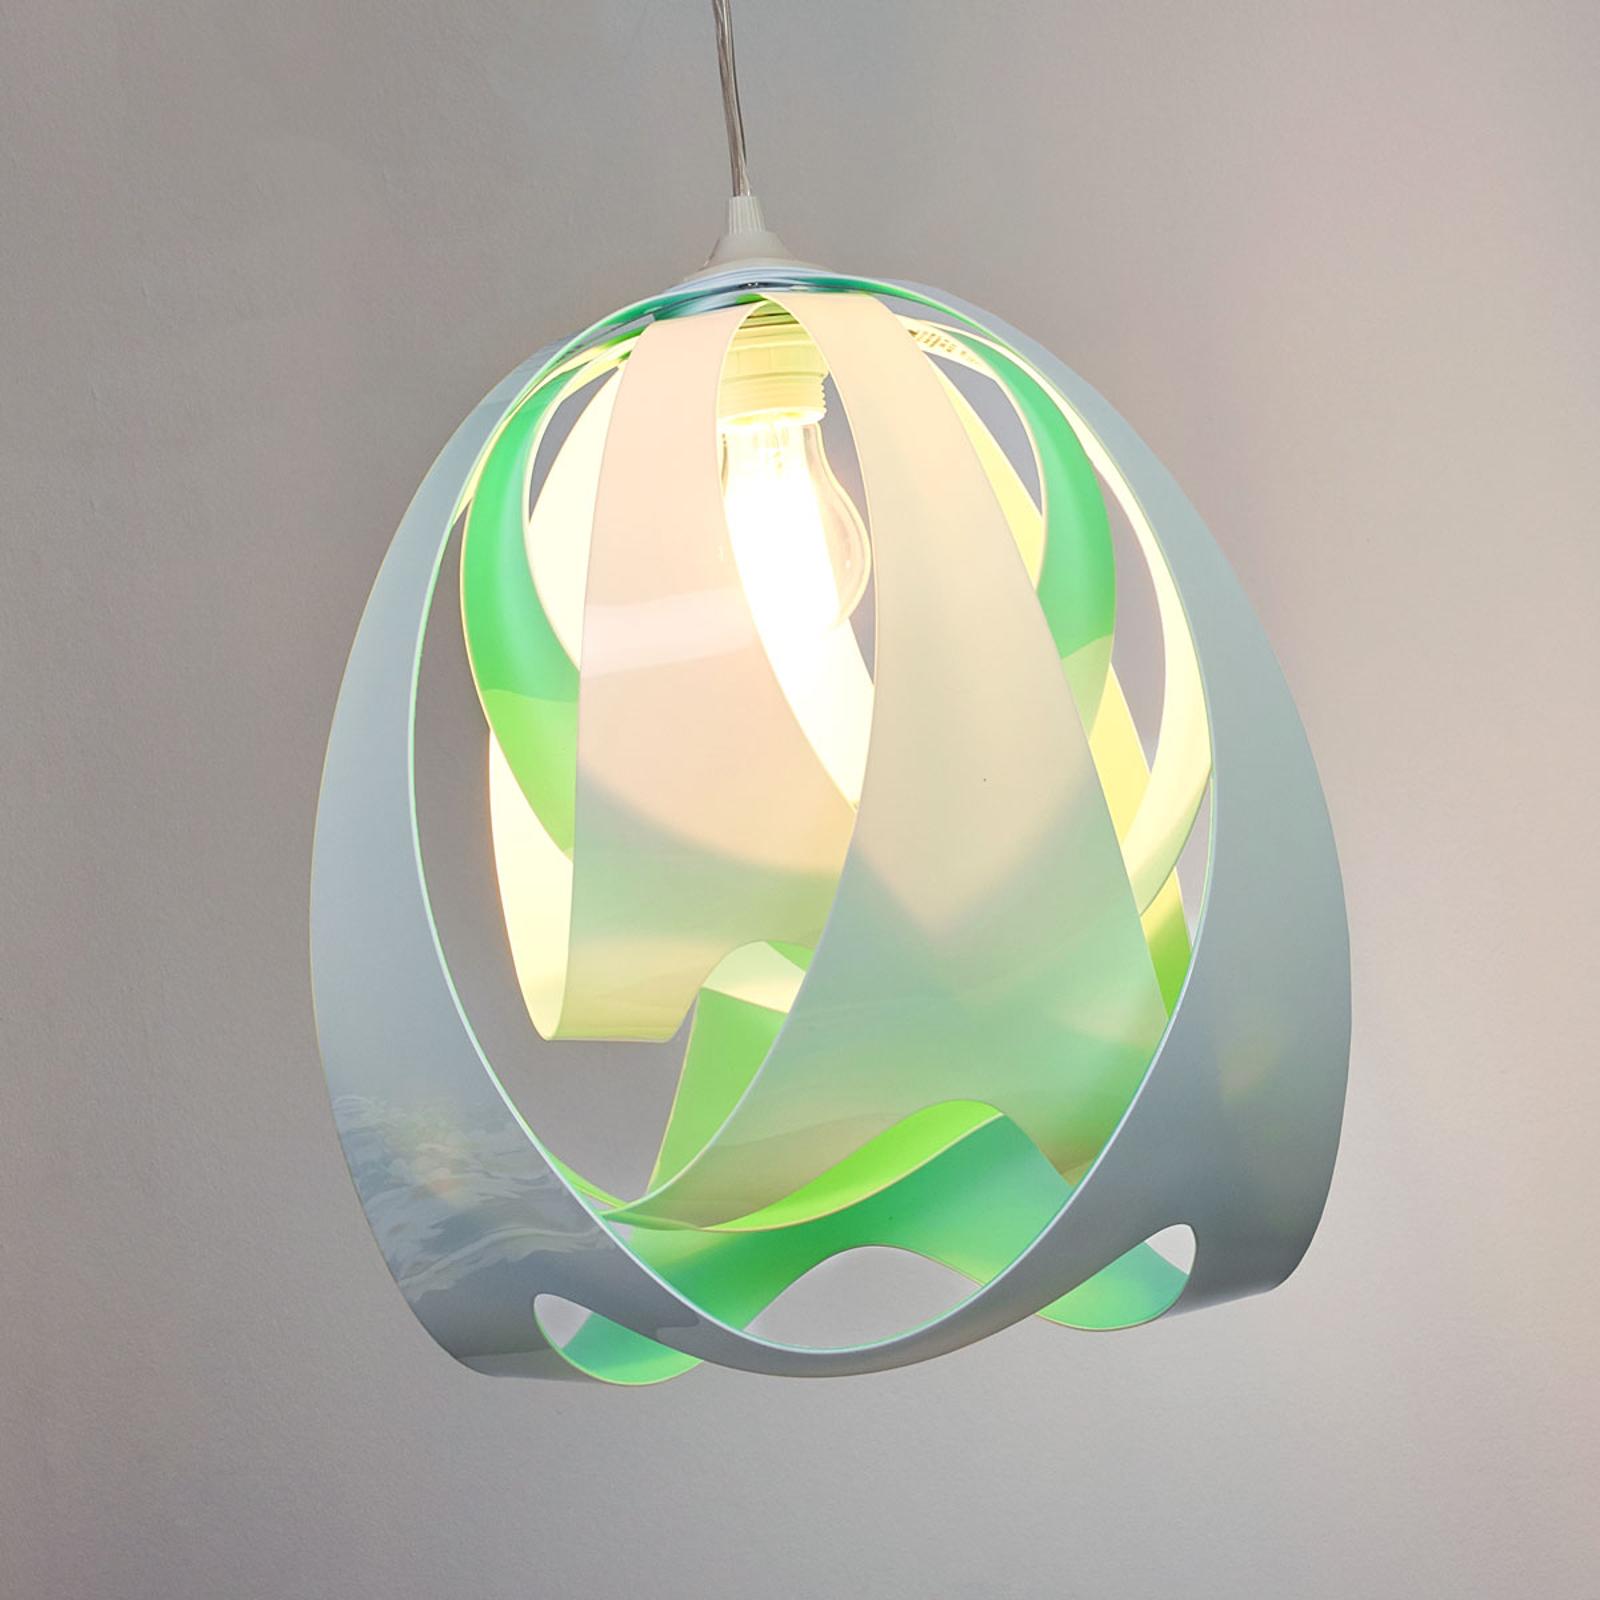 Slamp Goccia di Luce, hanglamp, blauw-groen